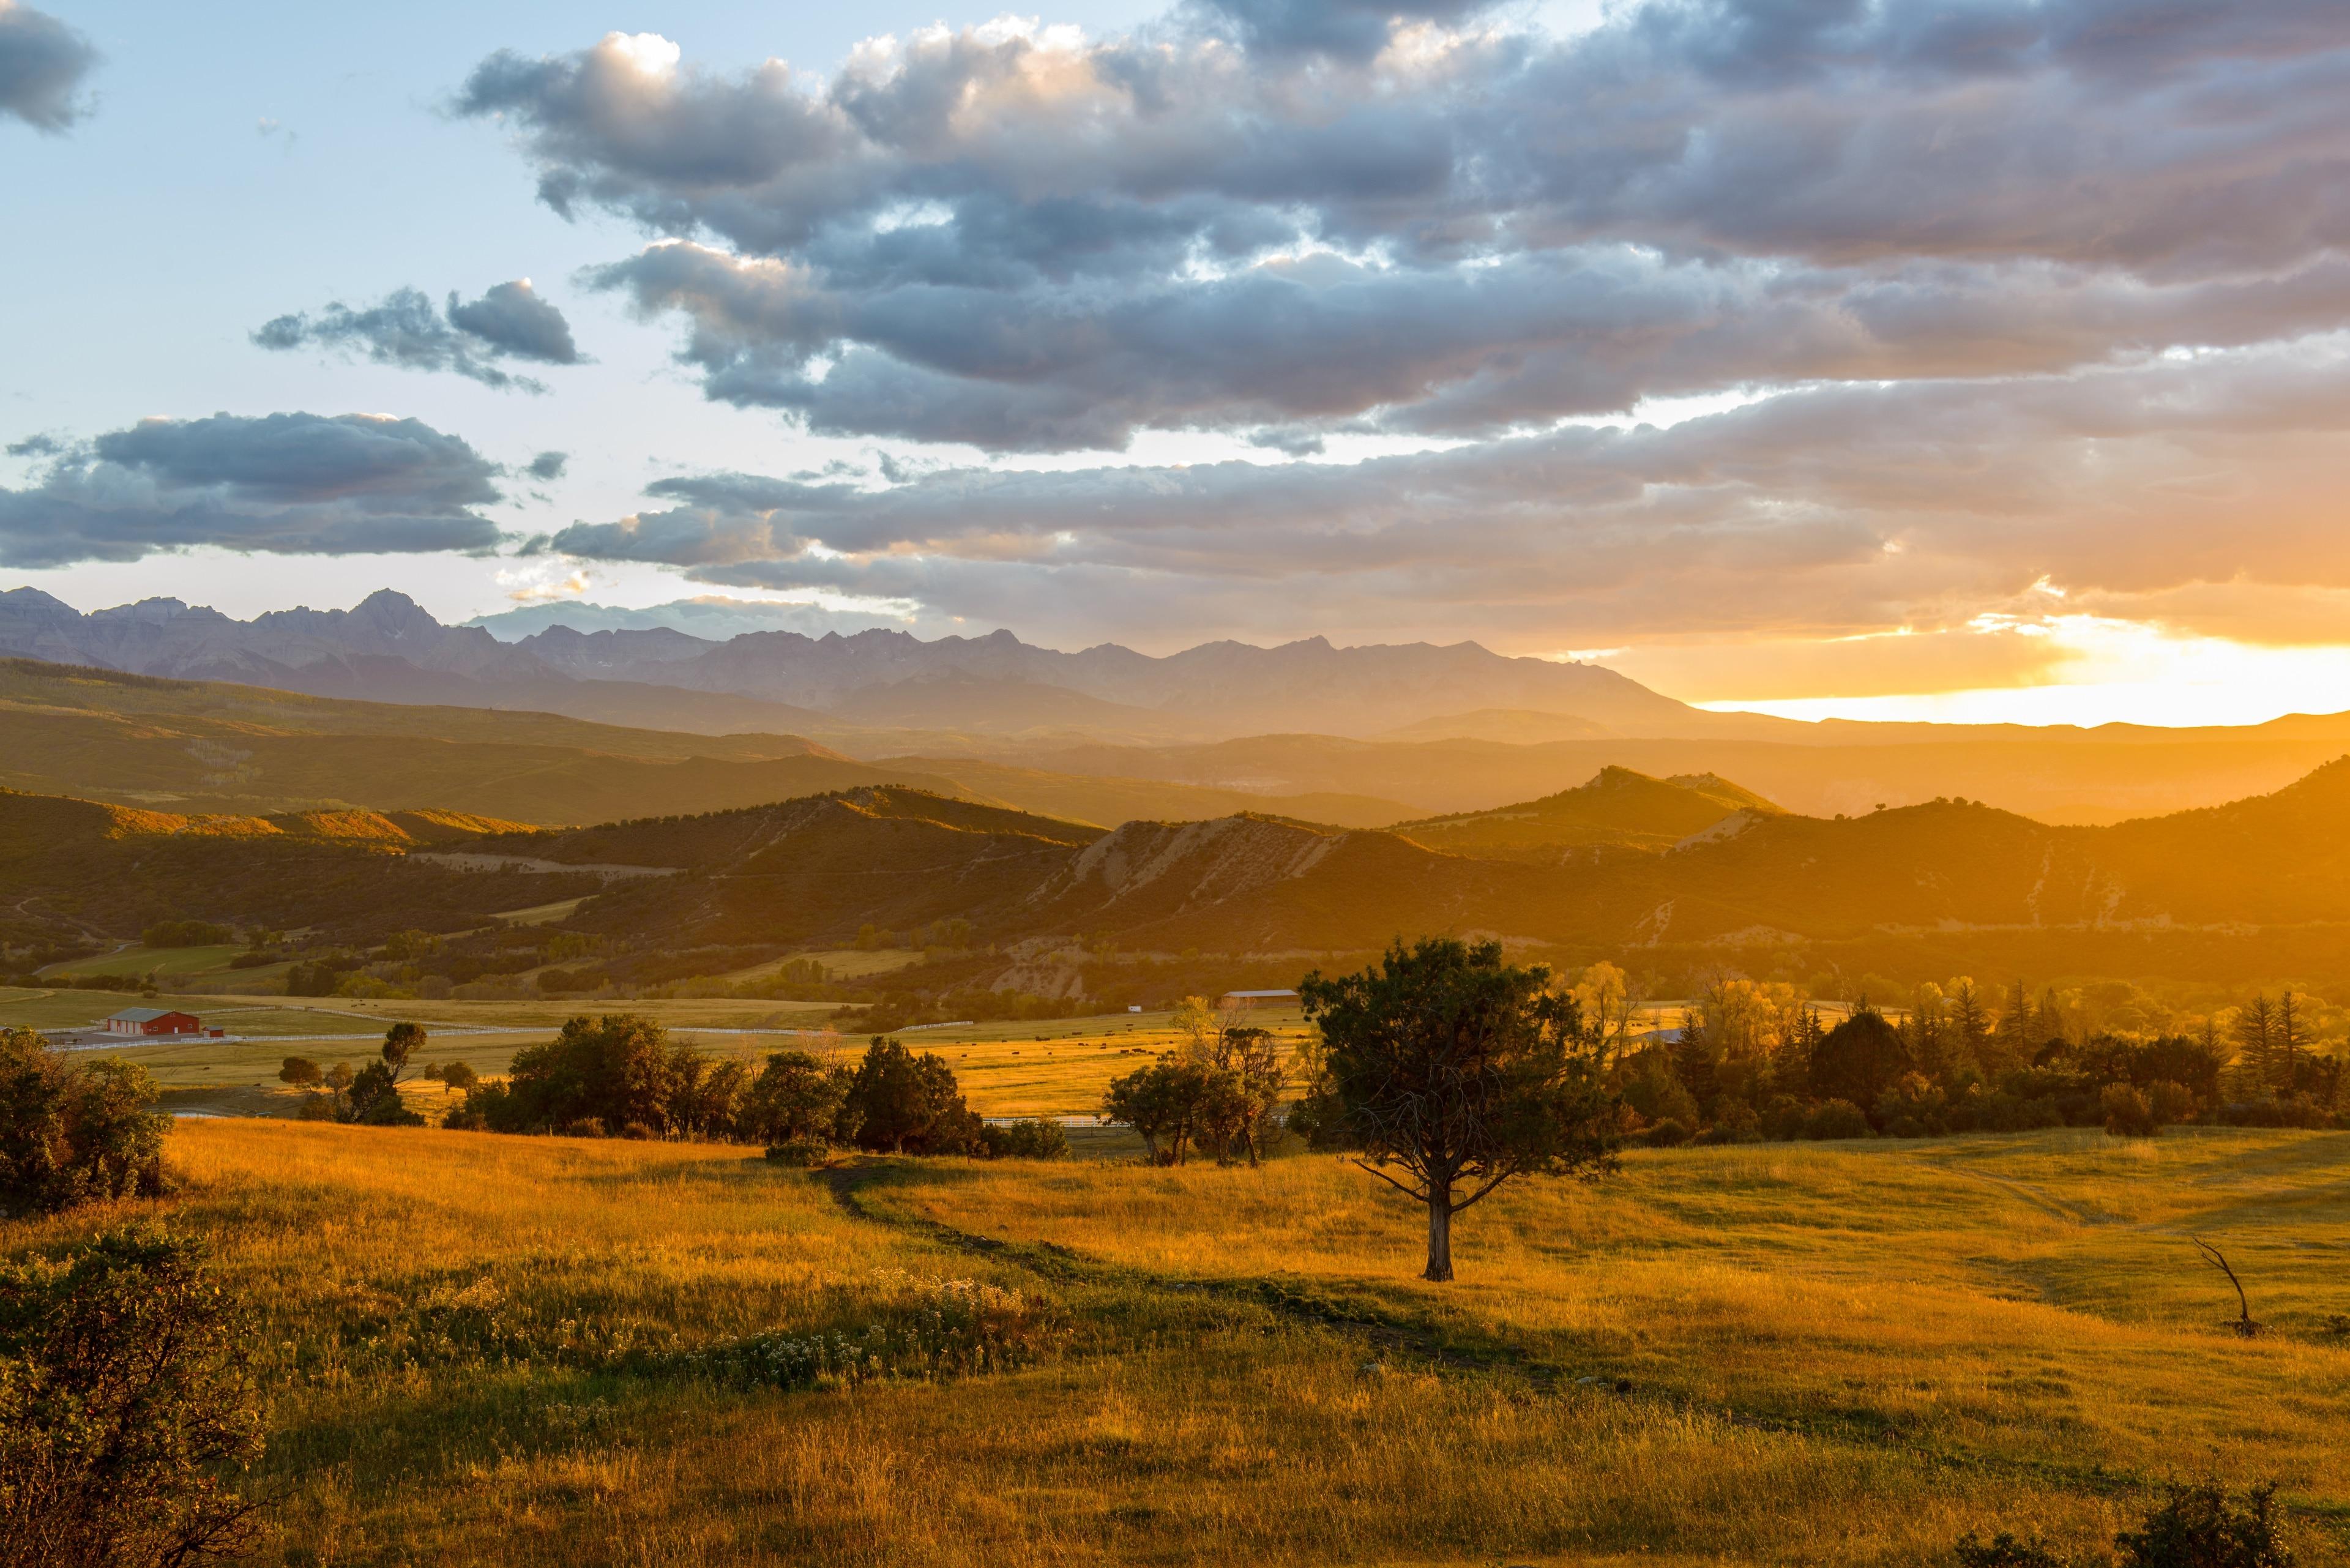 Mountain Village, Colorado, United States of America